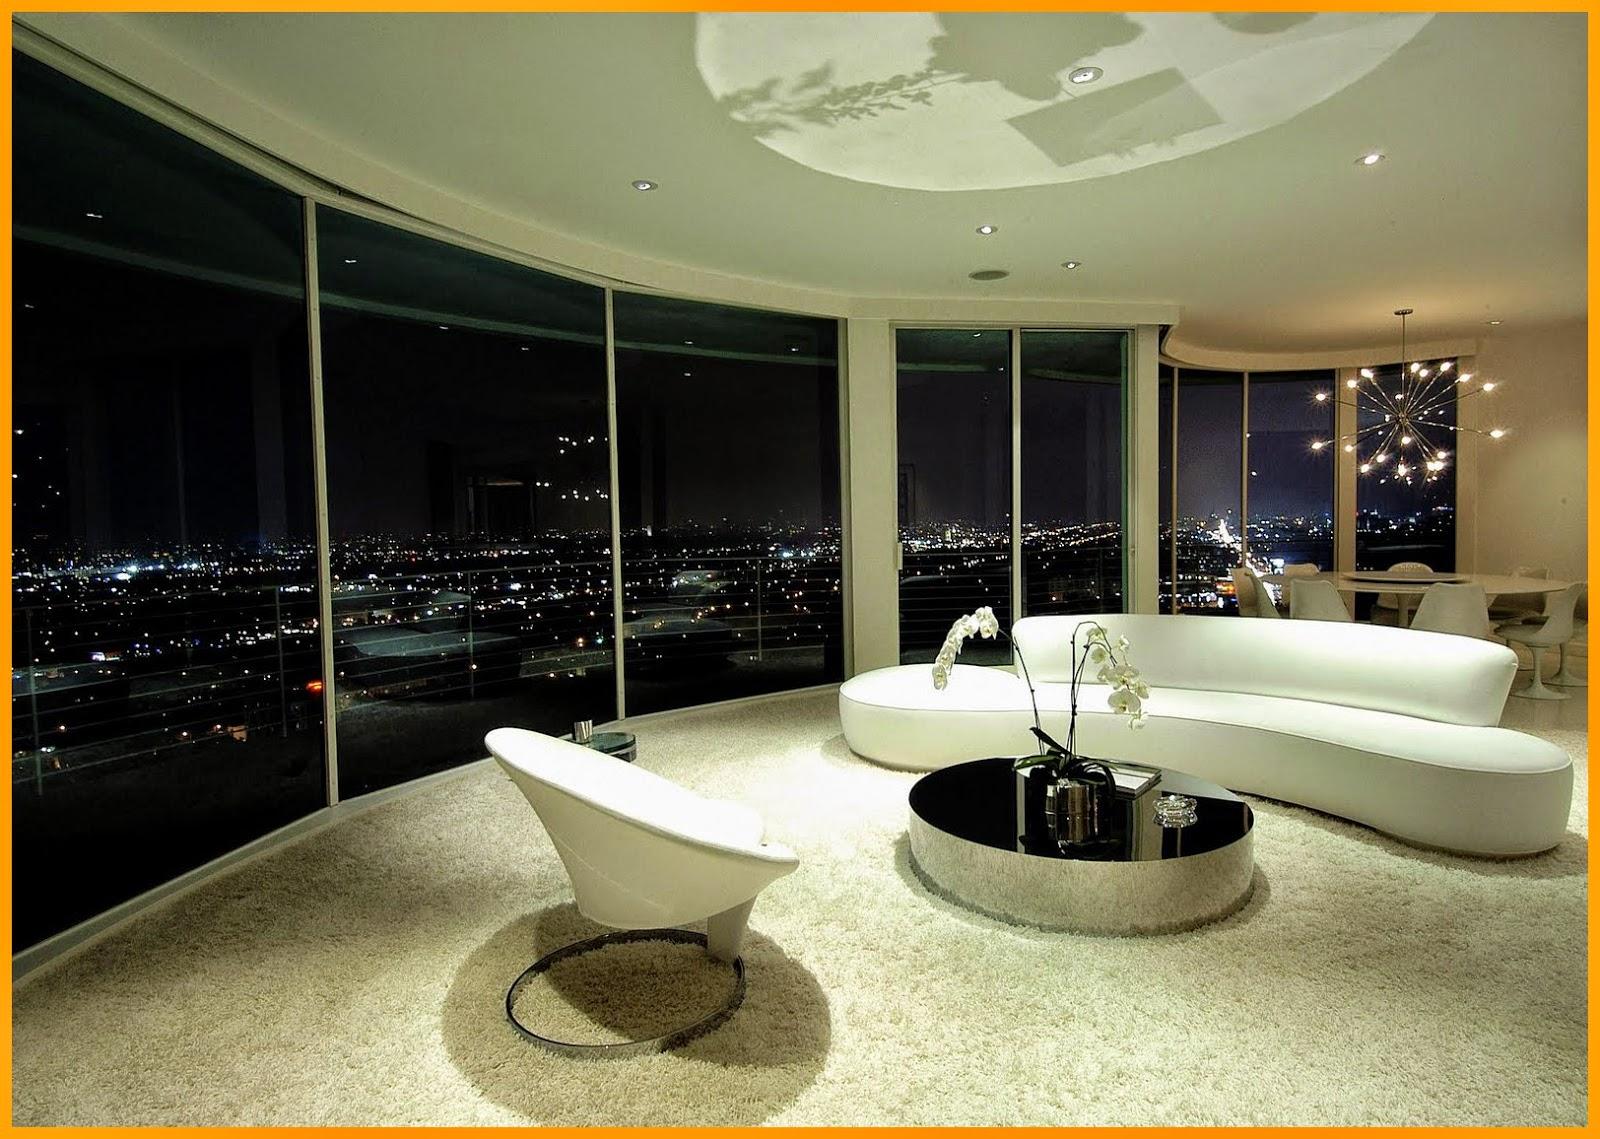 Alimustang home design future september 2014 for List of interior design organizations